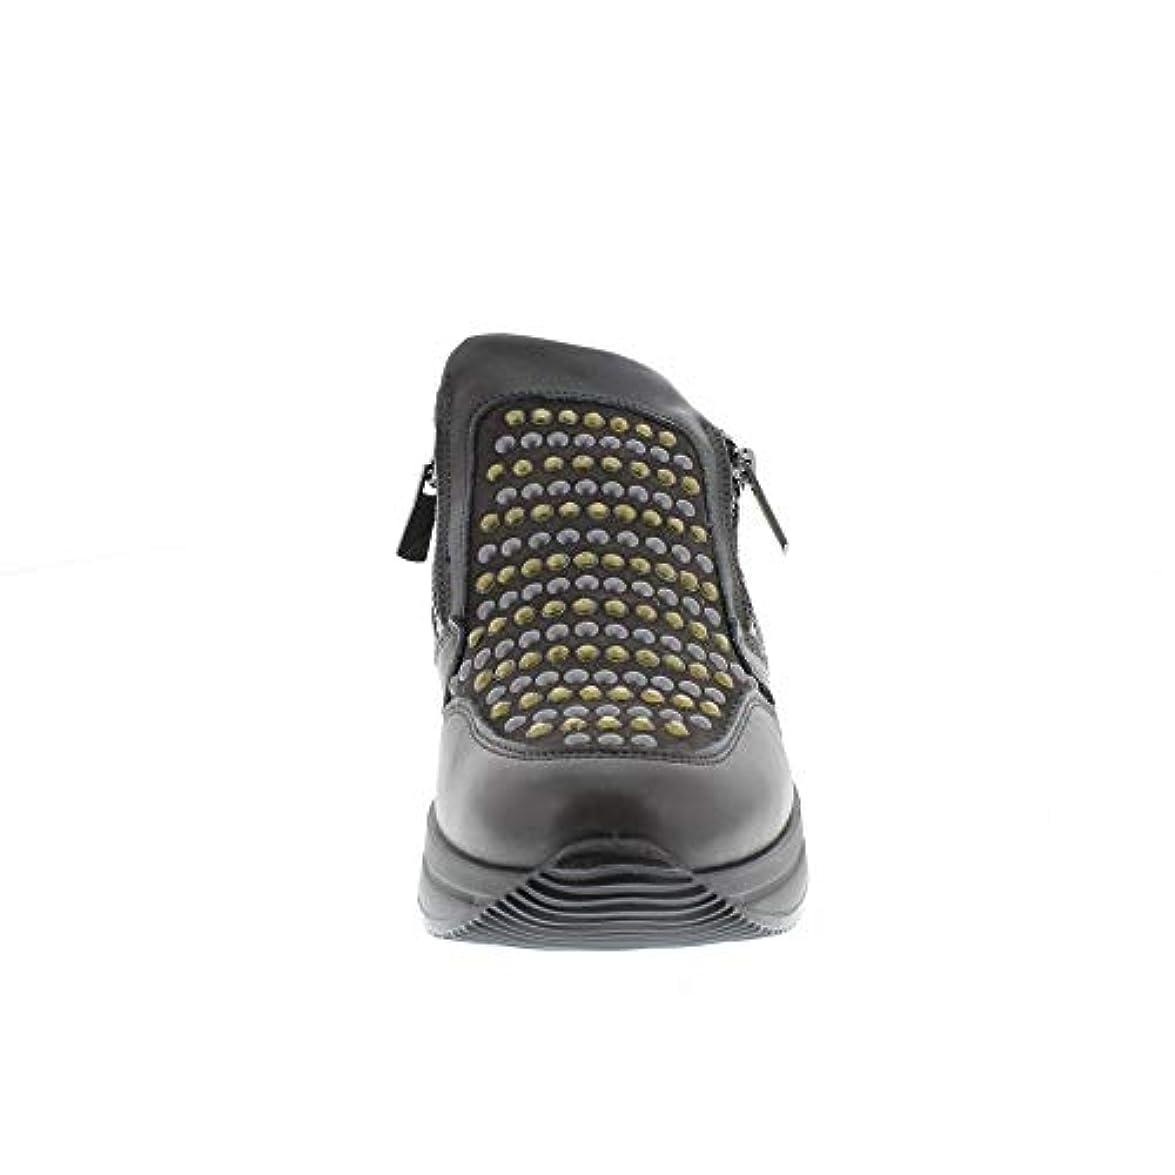 Igi amp; Co 8758 Sneaker Grigio 700 Taglia 41